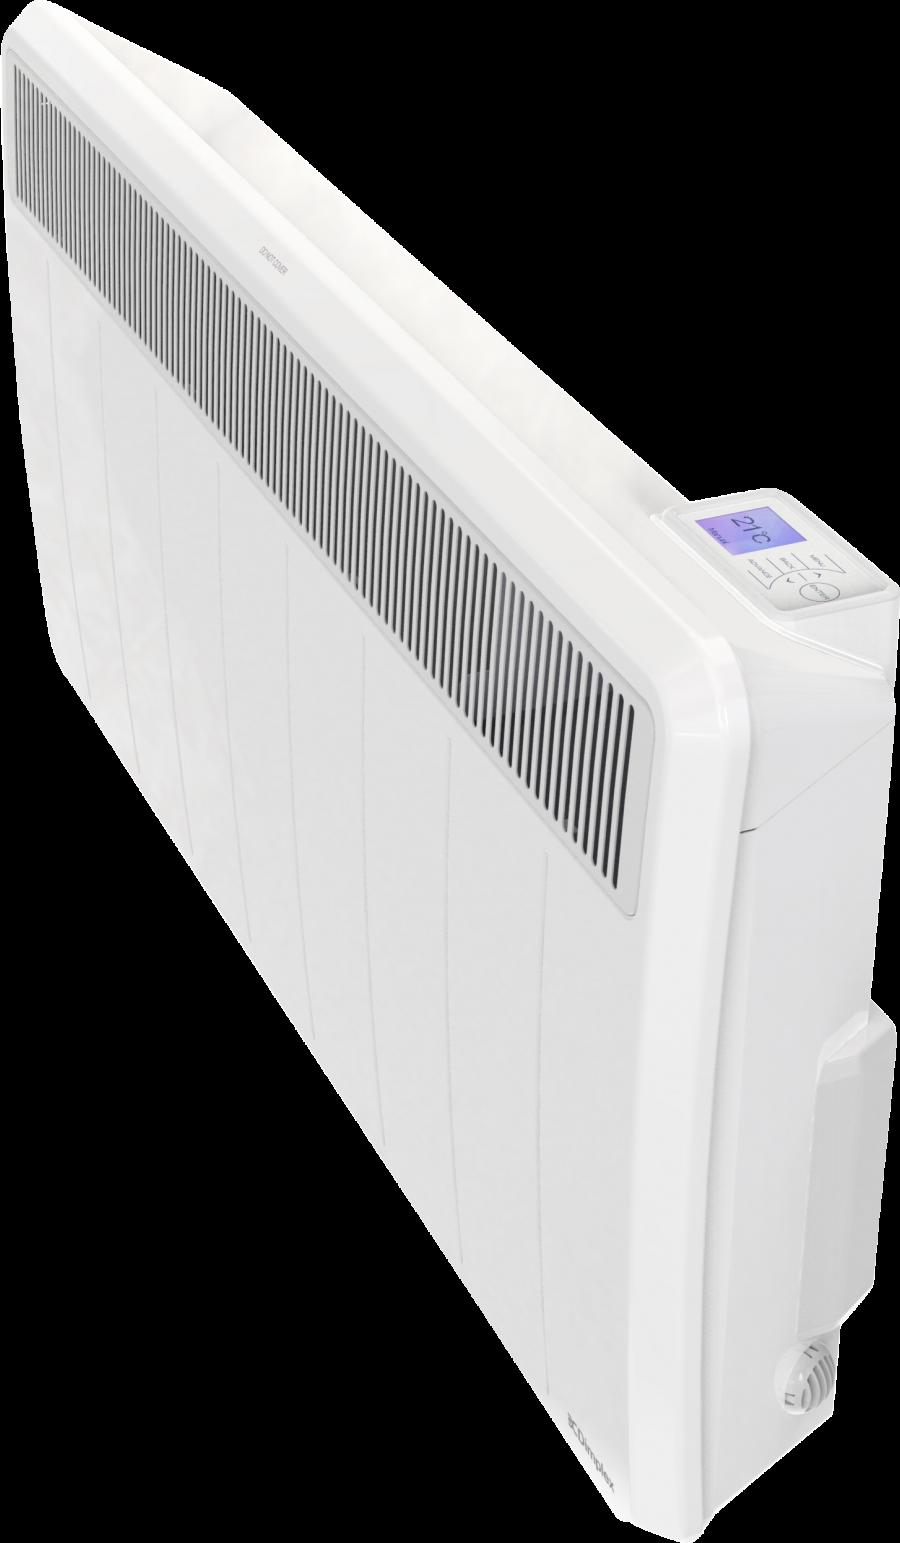 Dimplex Plxc300e 3 00kw Panel Heater Lot 20 Compliant W